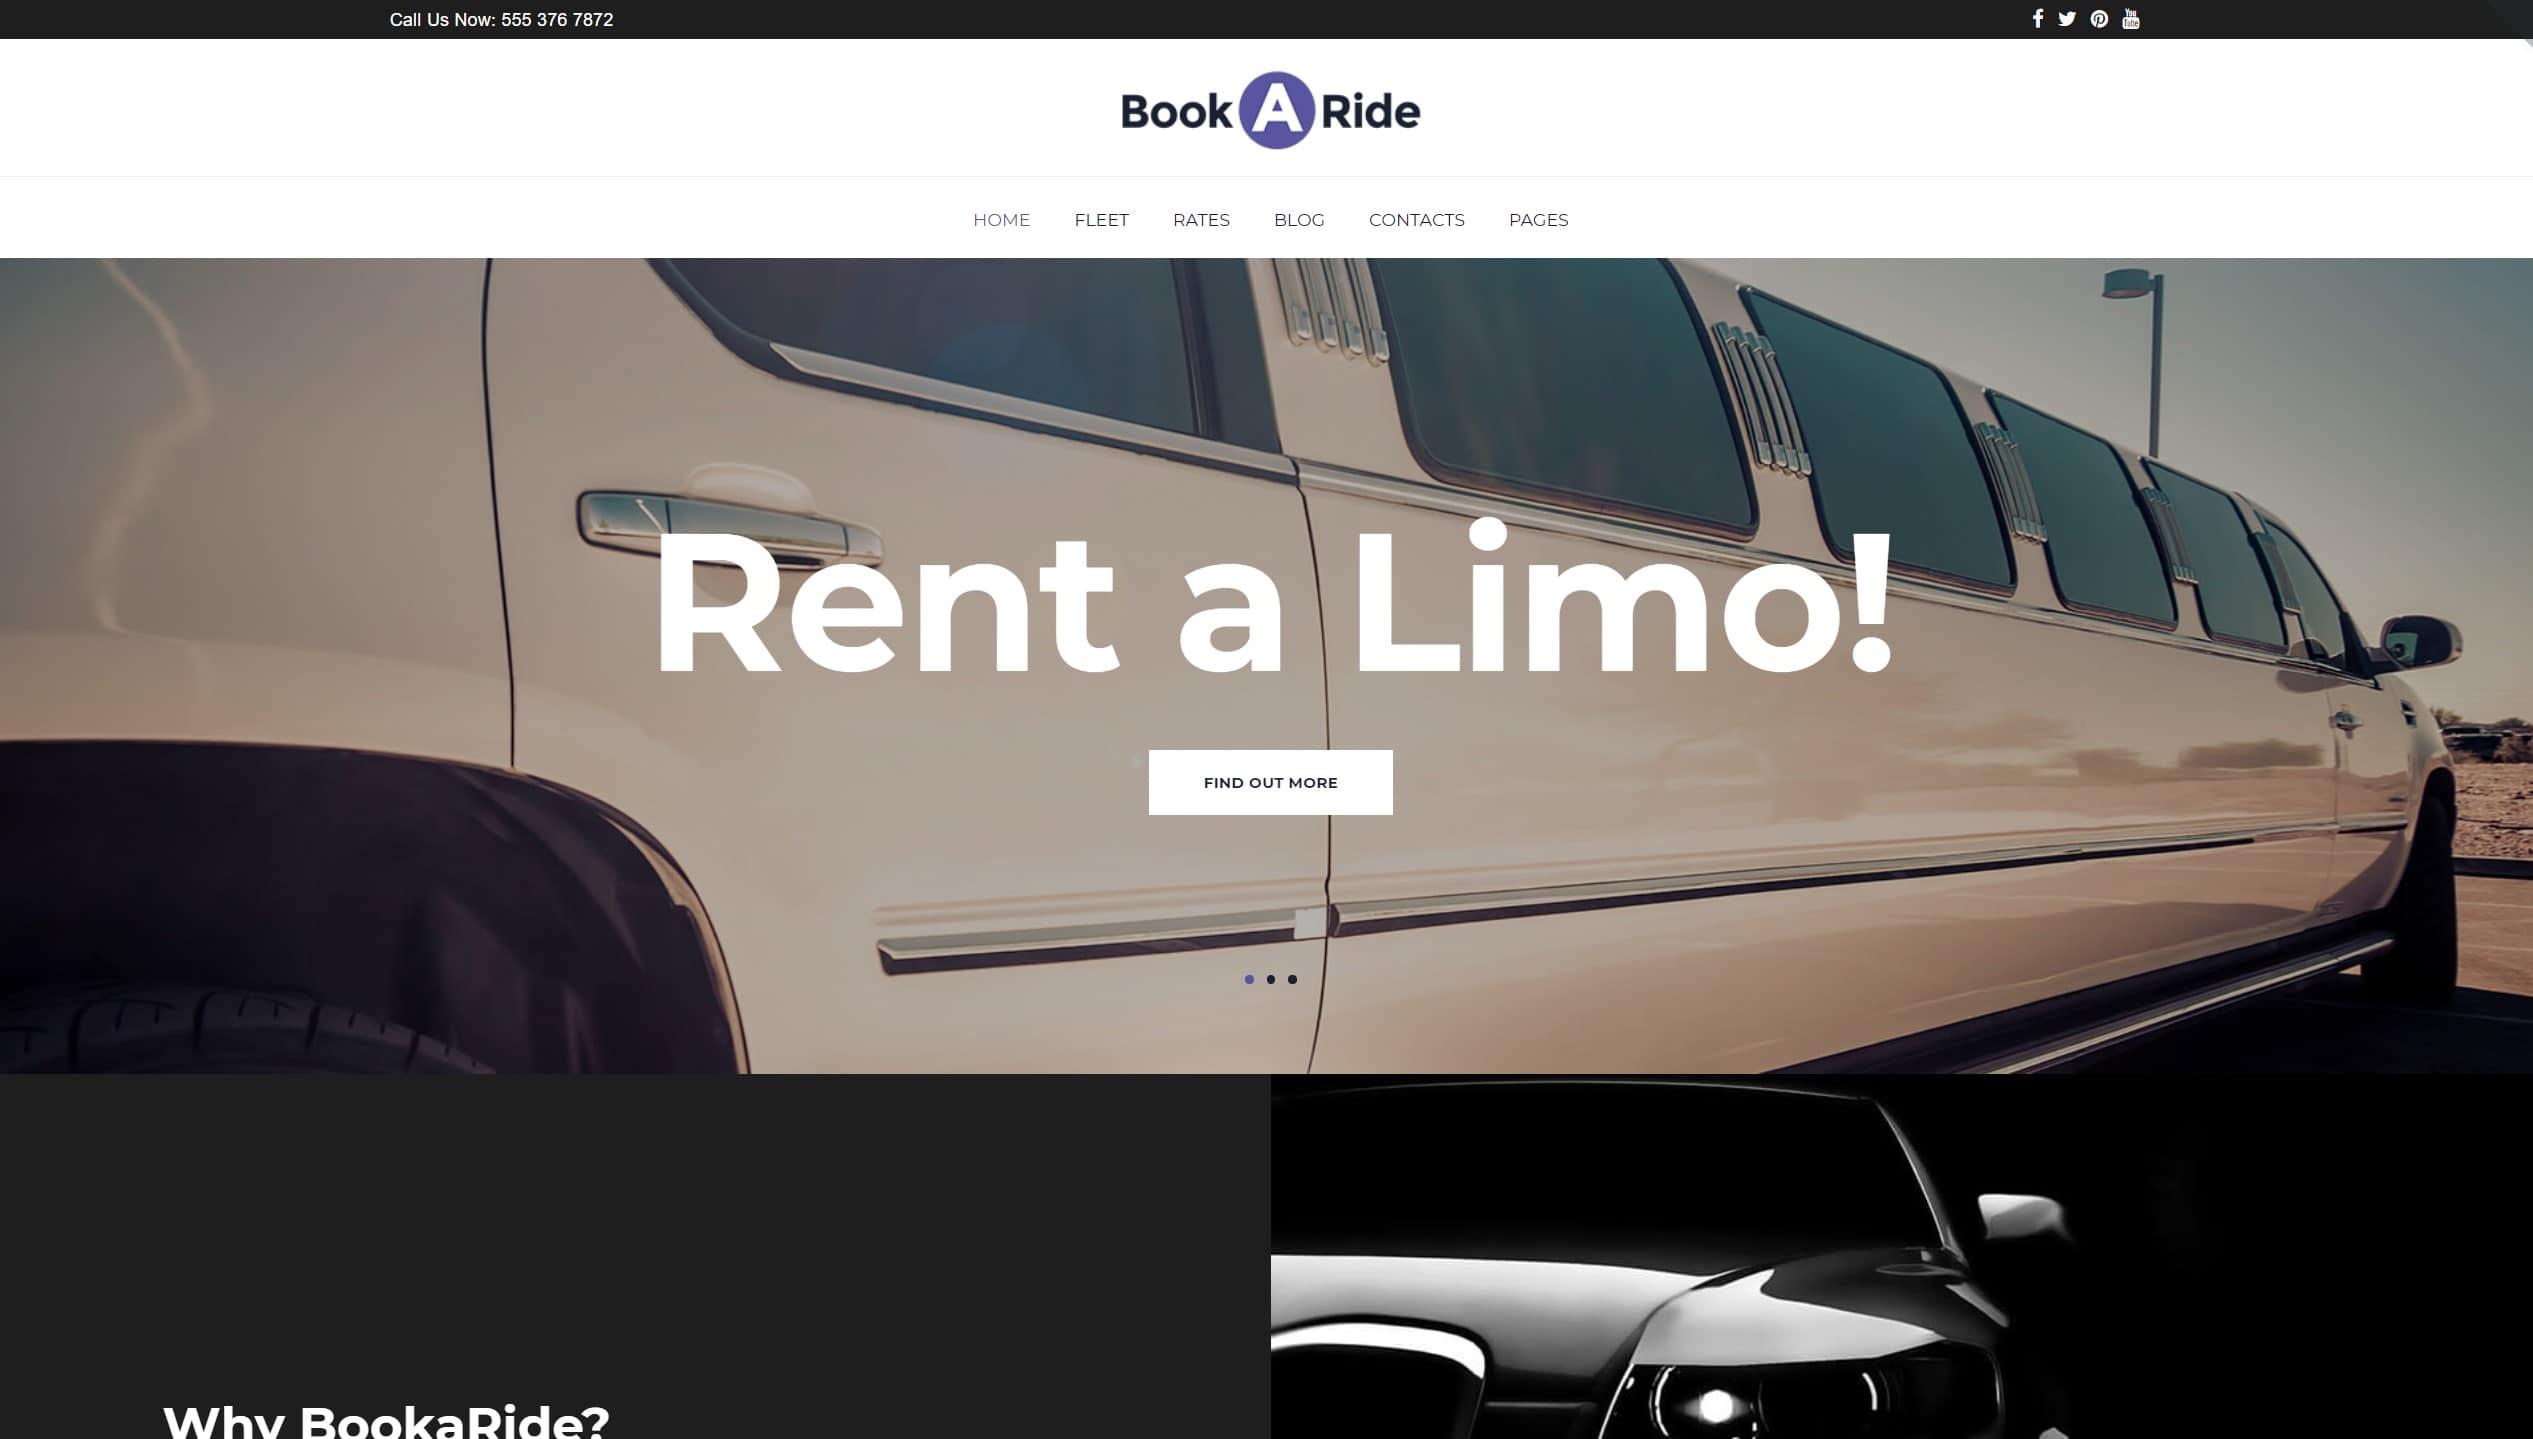 Авто шаблоны WordPress и шаблоны сайта авто для аренды и проката